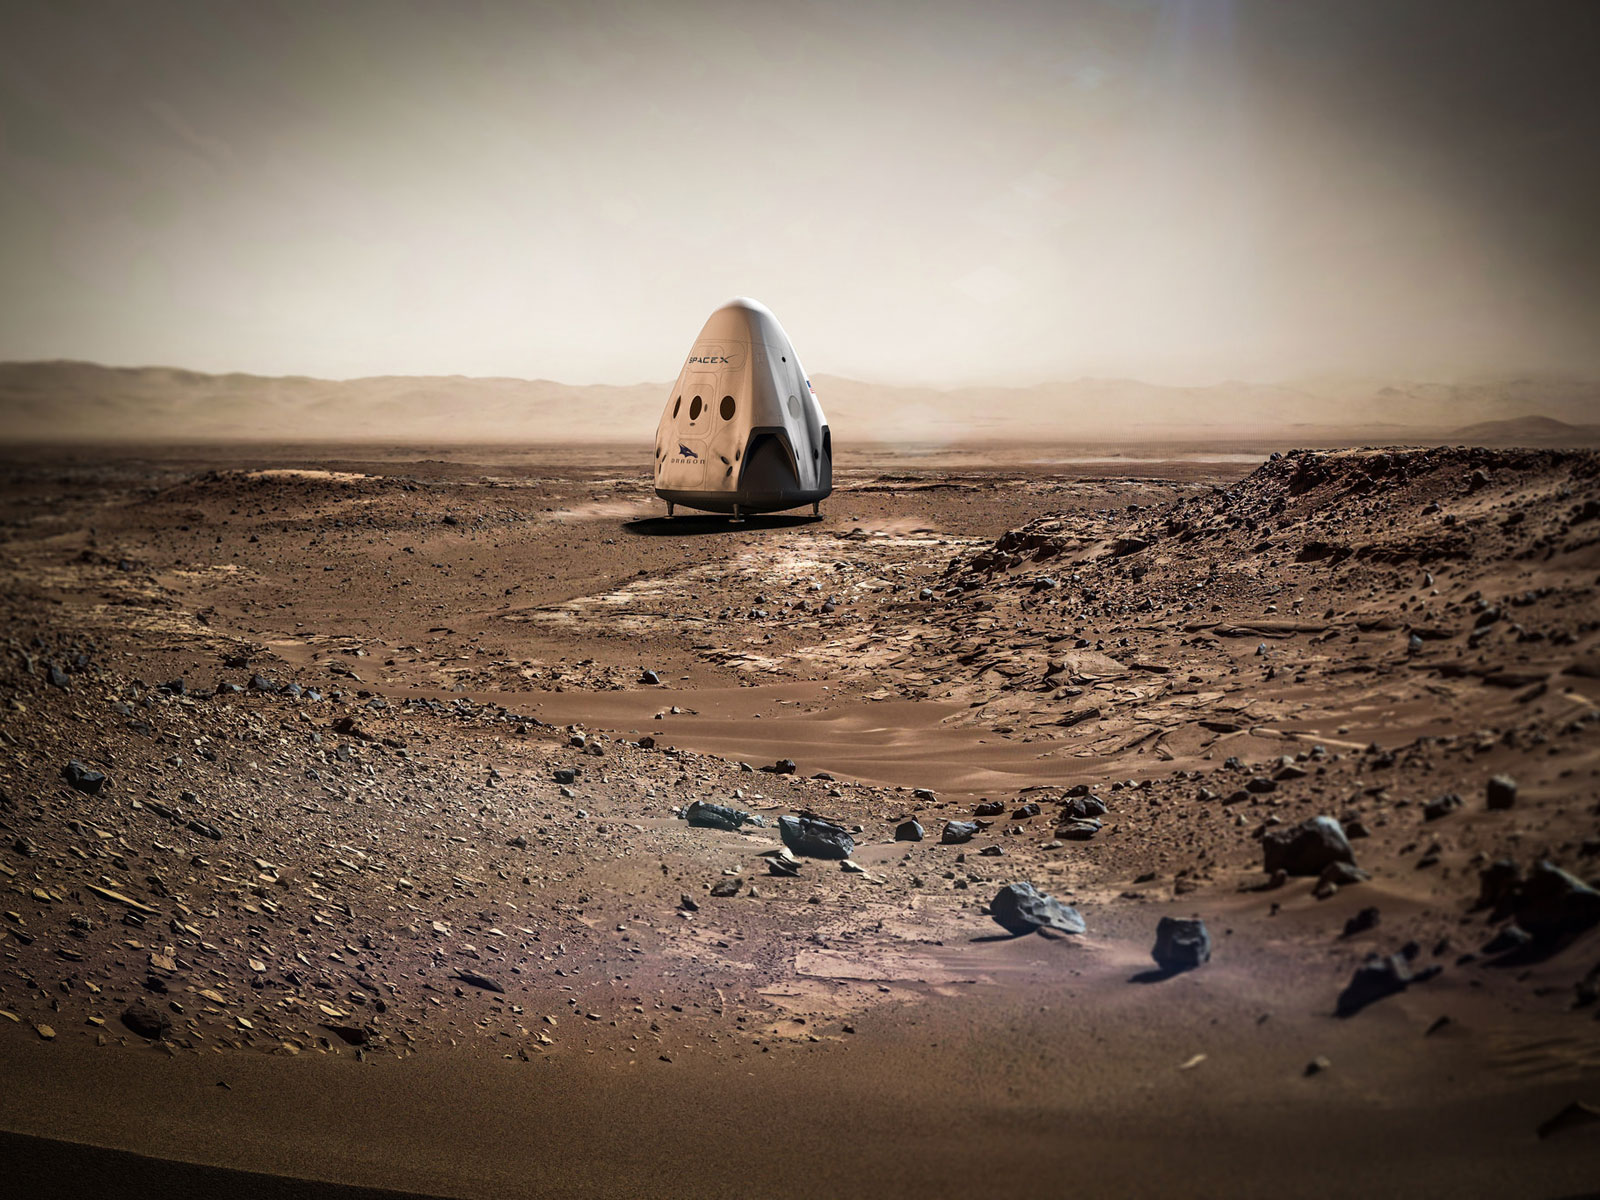 Sending Dragon to Mars | Space Wallpaper